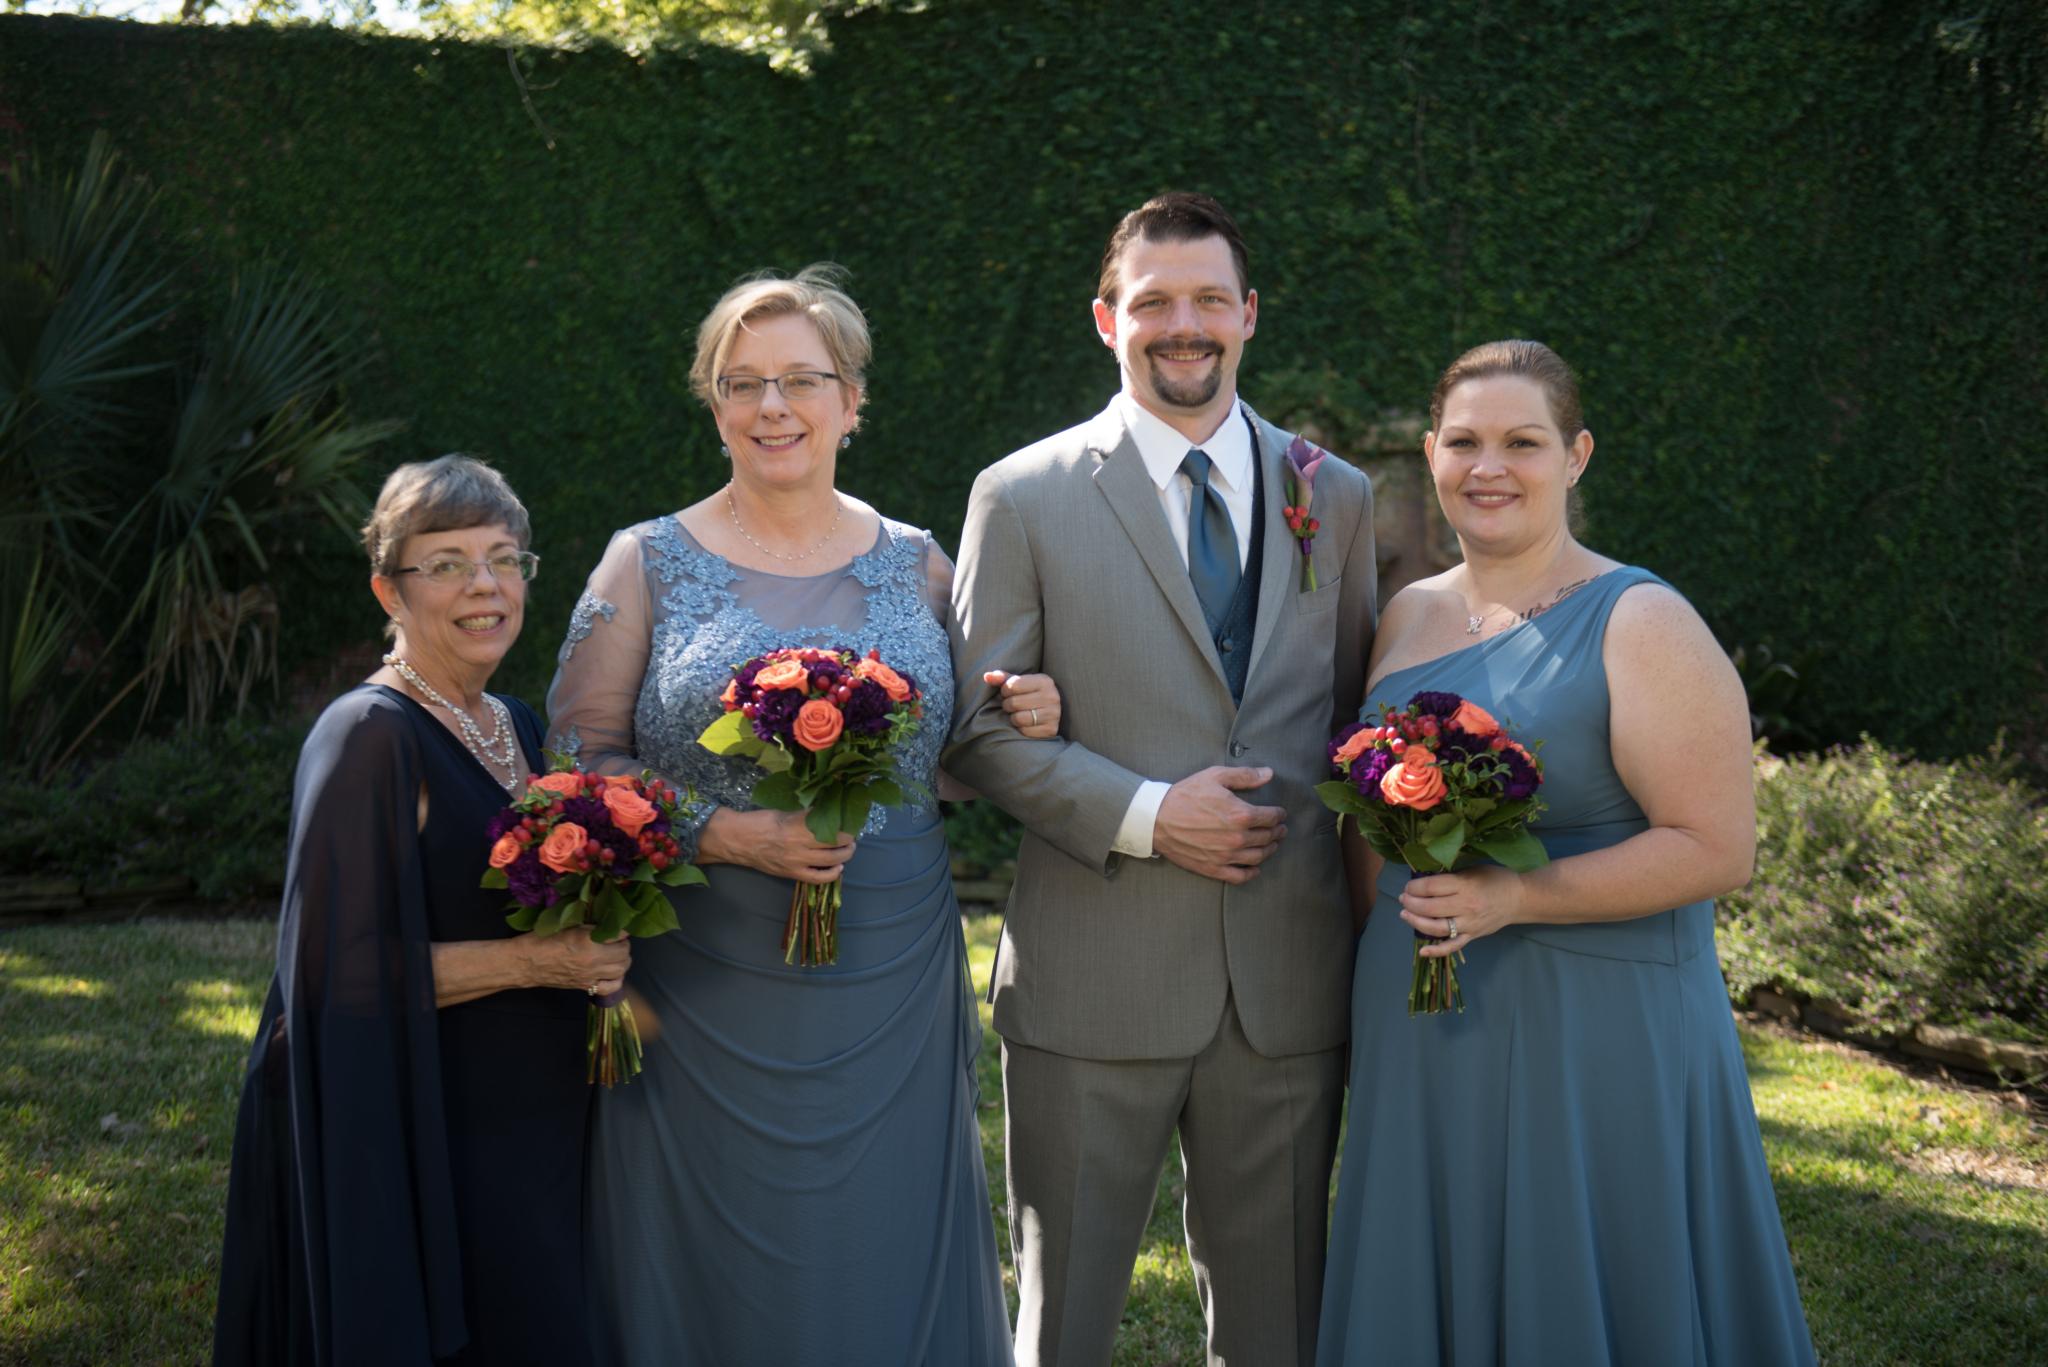 wedding family garden portrait